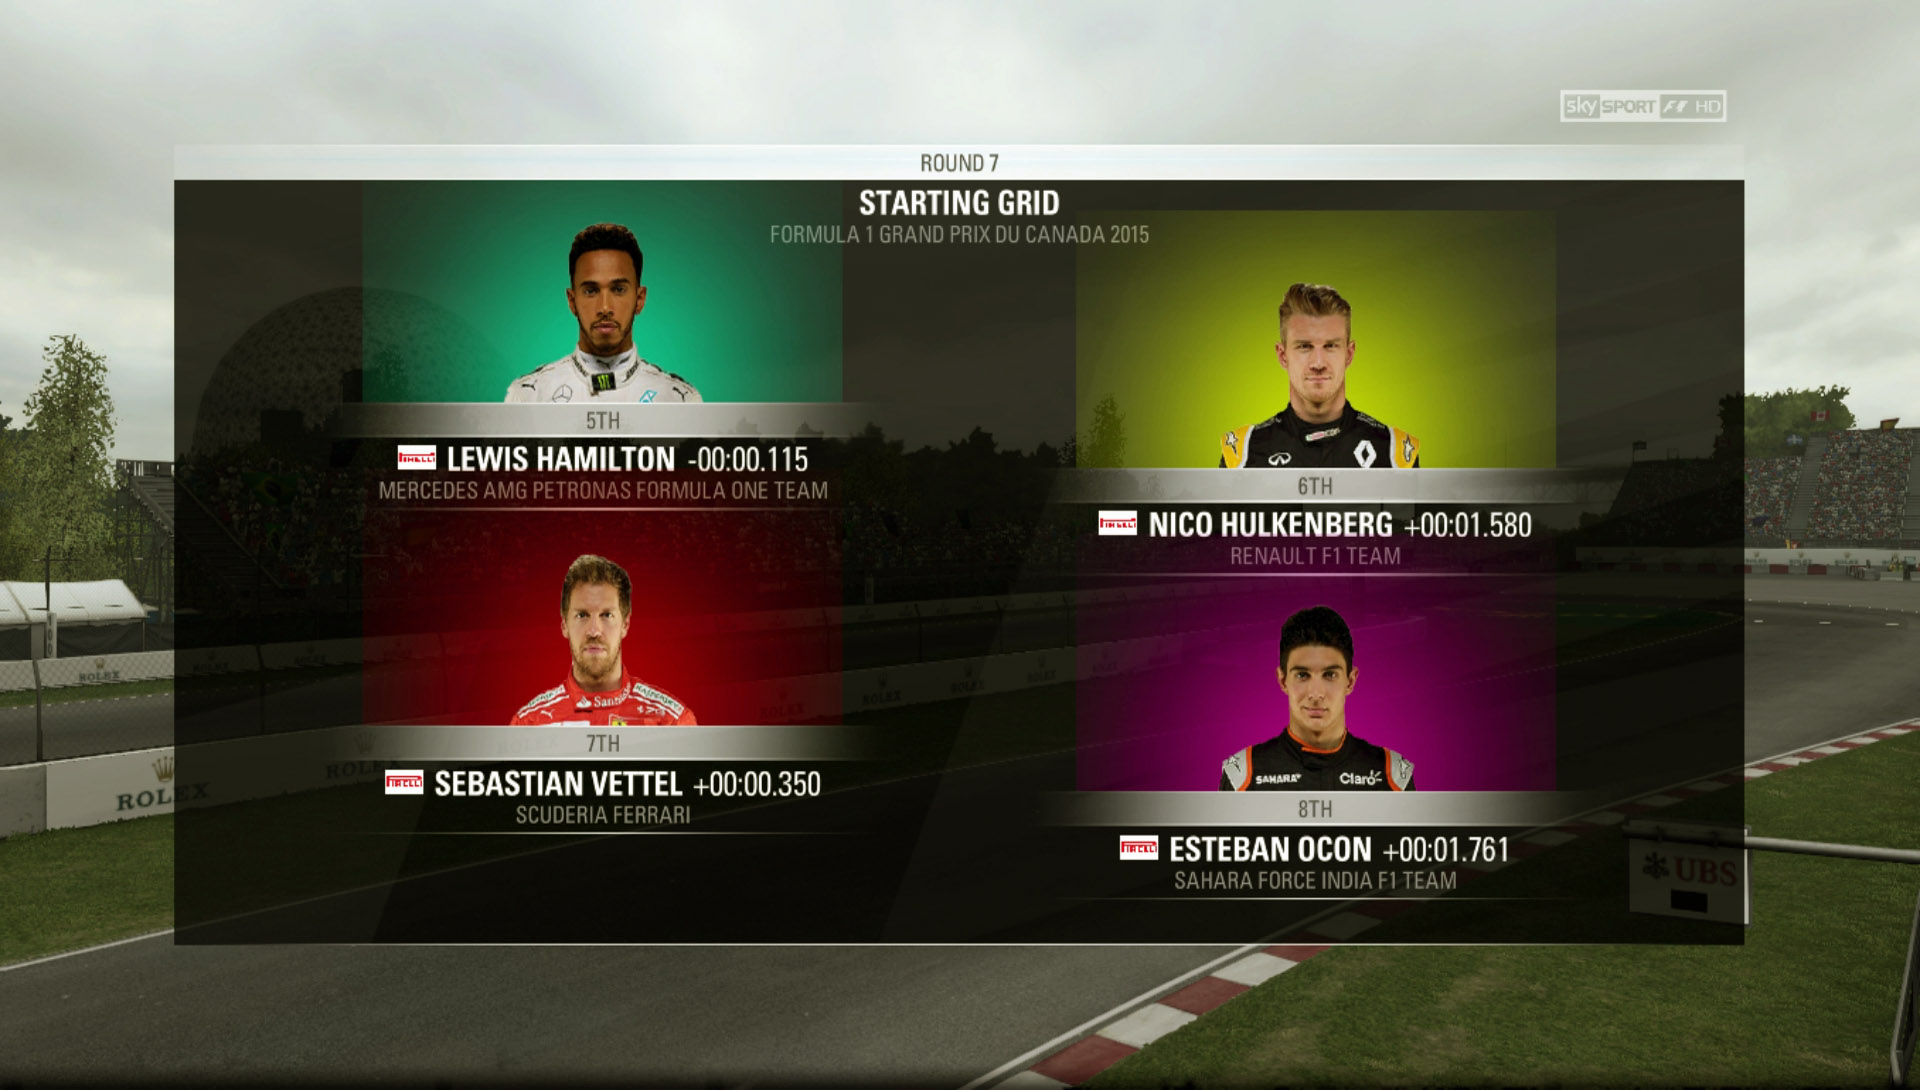 F1 sky sports images.jpg